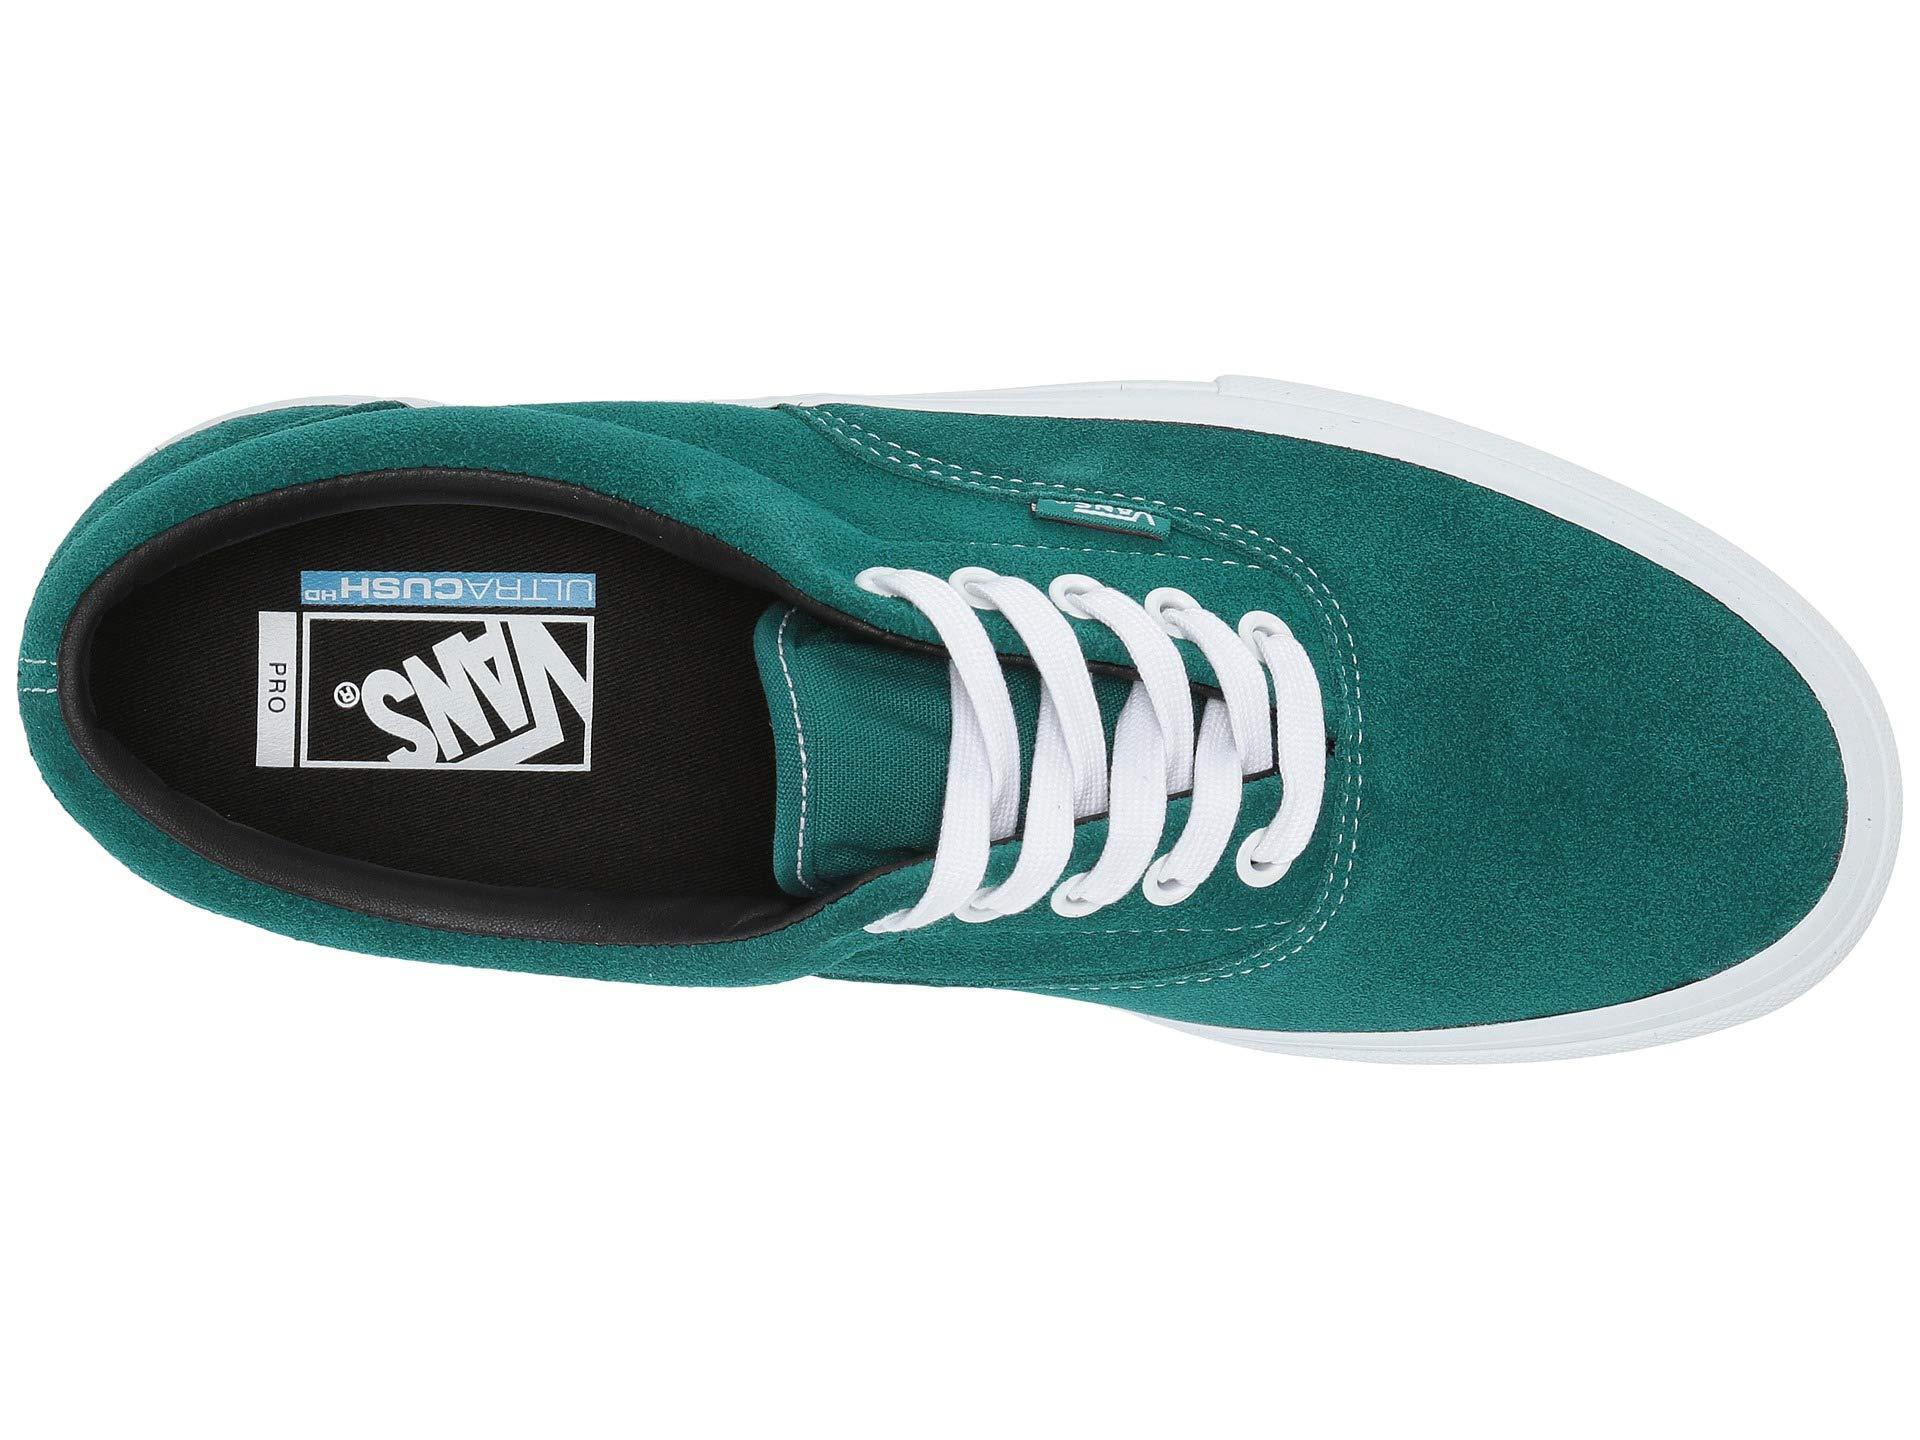 Lyst - Vans Era Pro (blackout) Men s Skate Shoes in Green for Men 1eb69f83c